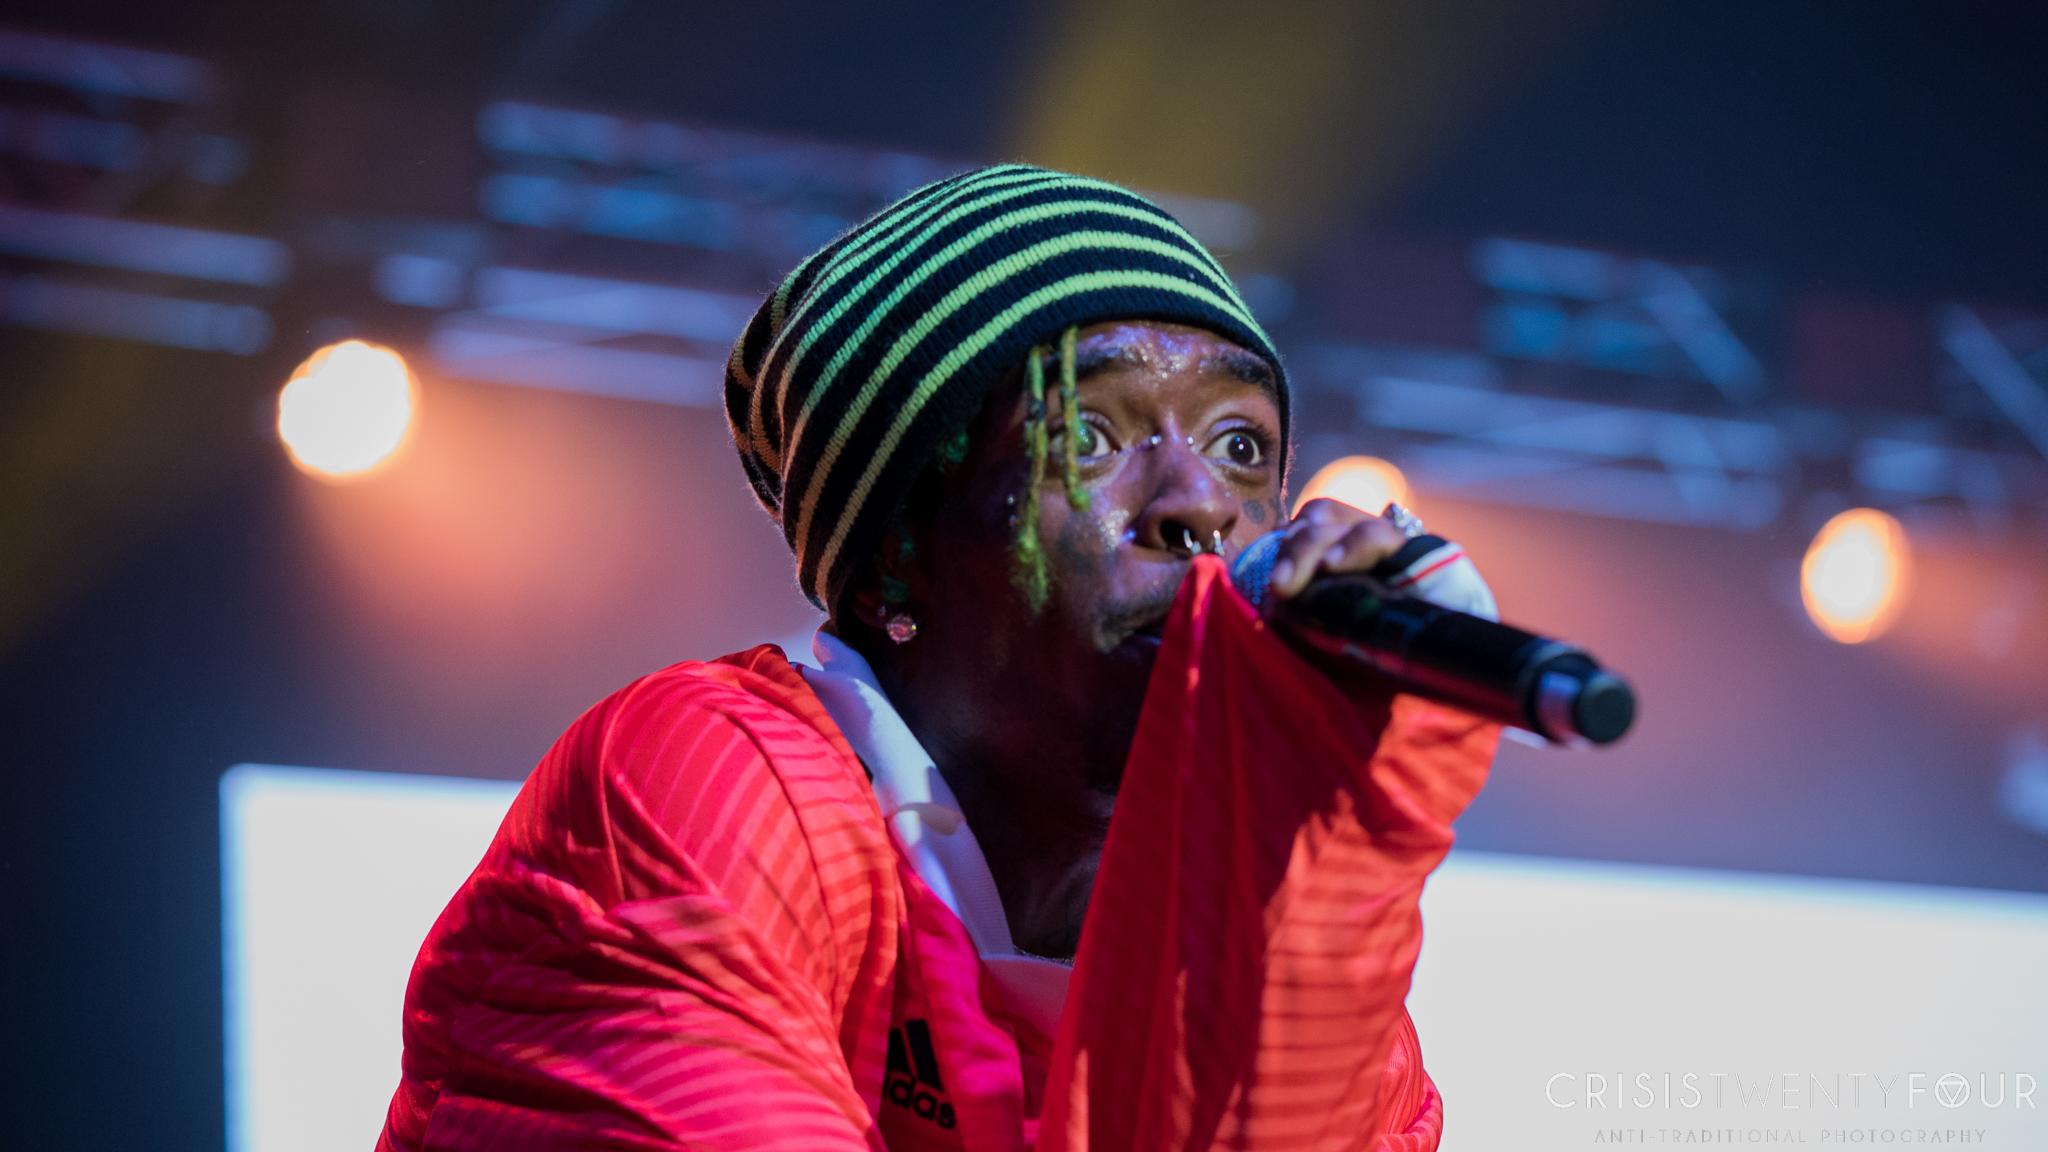 Concert Review - Lil Uzi Vert, Auckland New Zealand, 2018